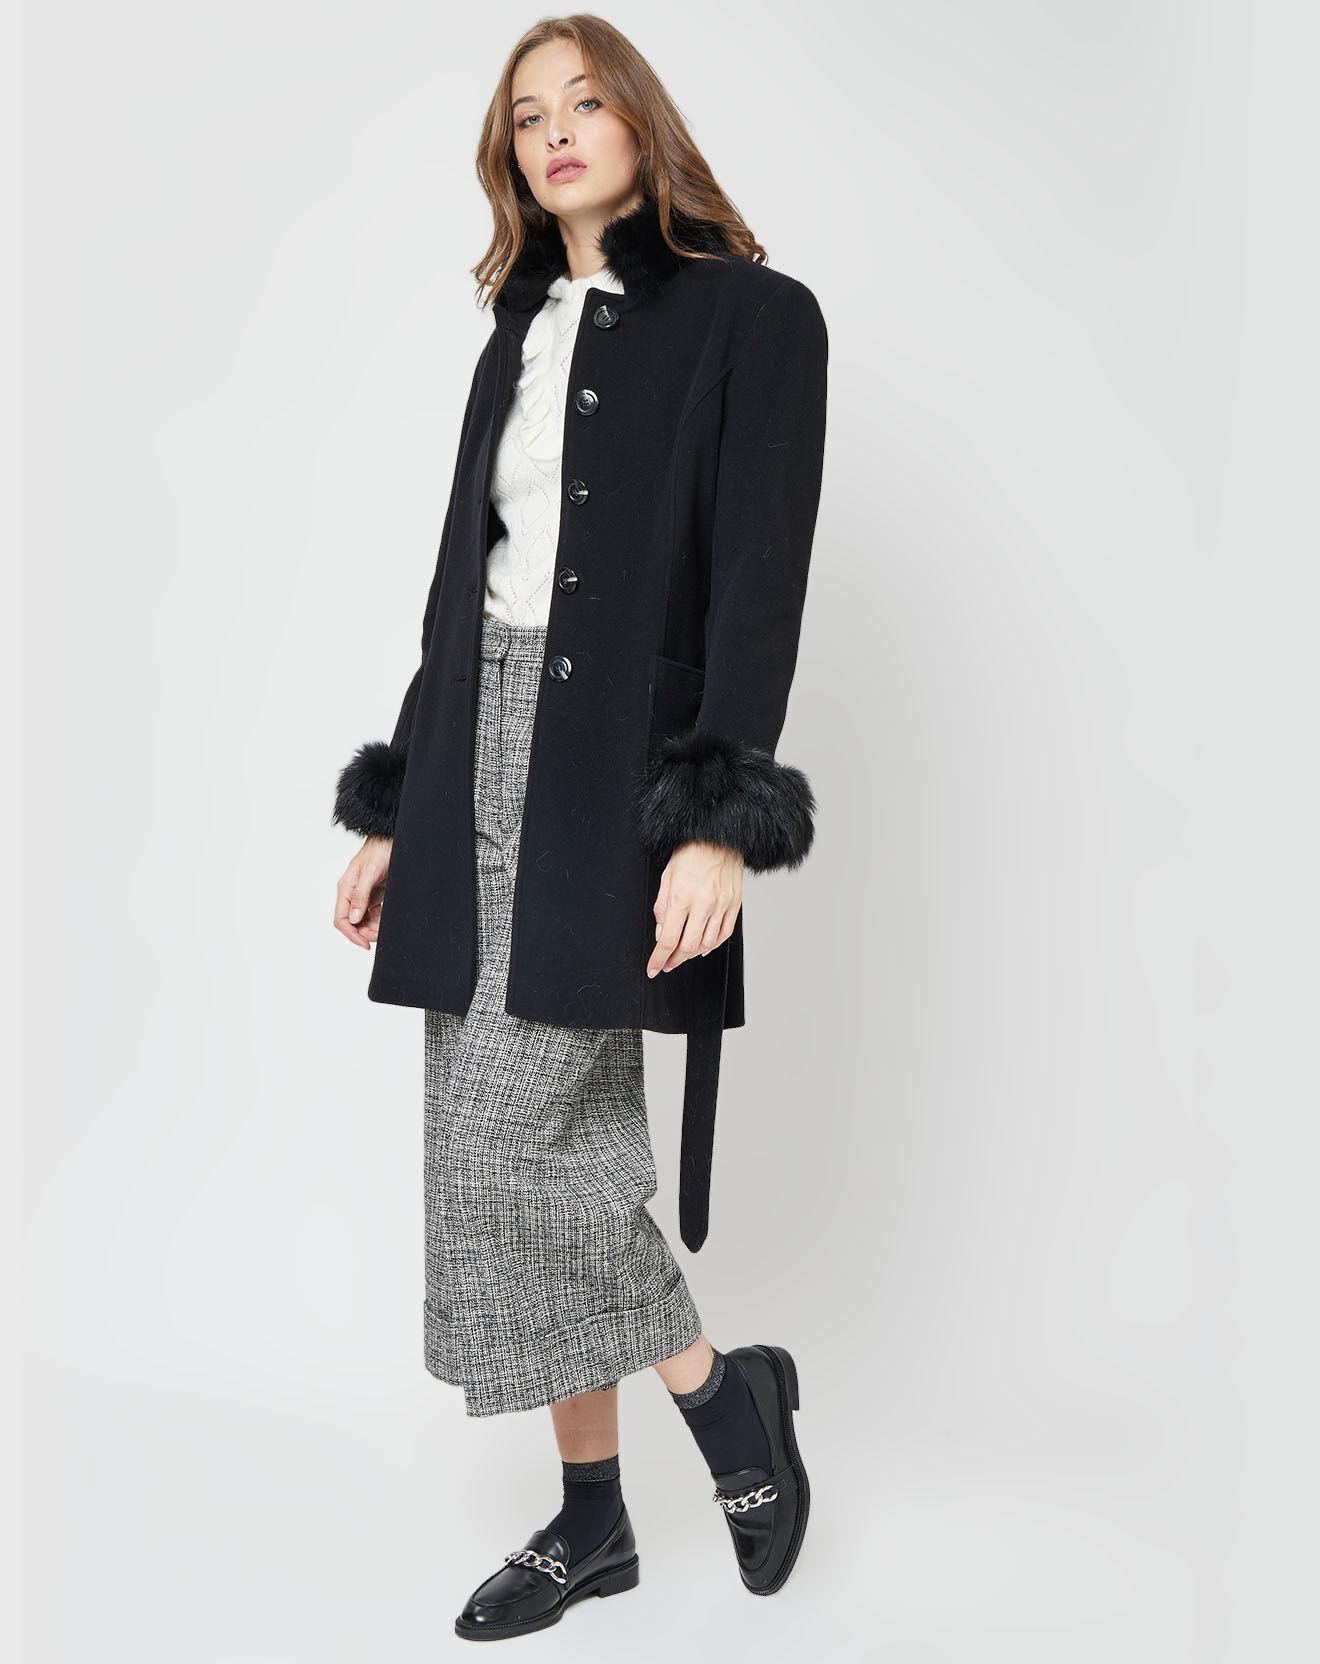 Manteau Betty en Laine mélangée bords Renard noir - Baya - Modalova